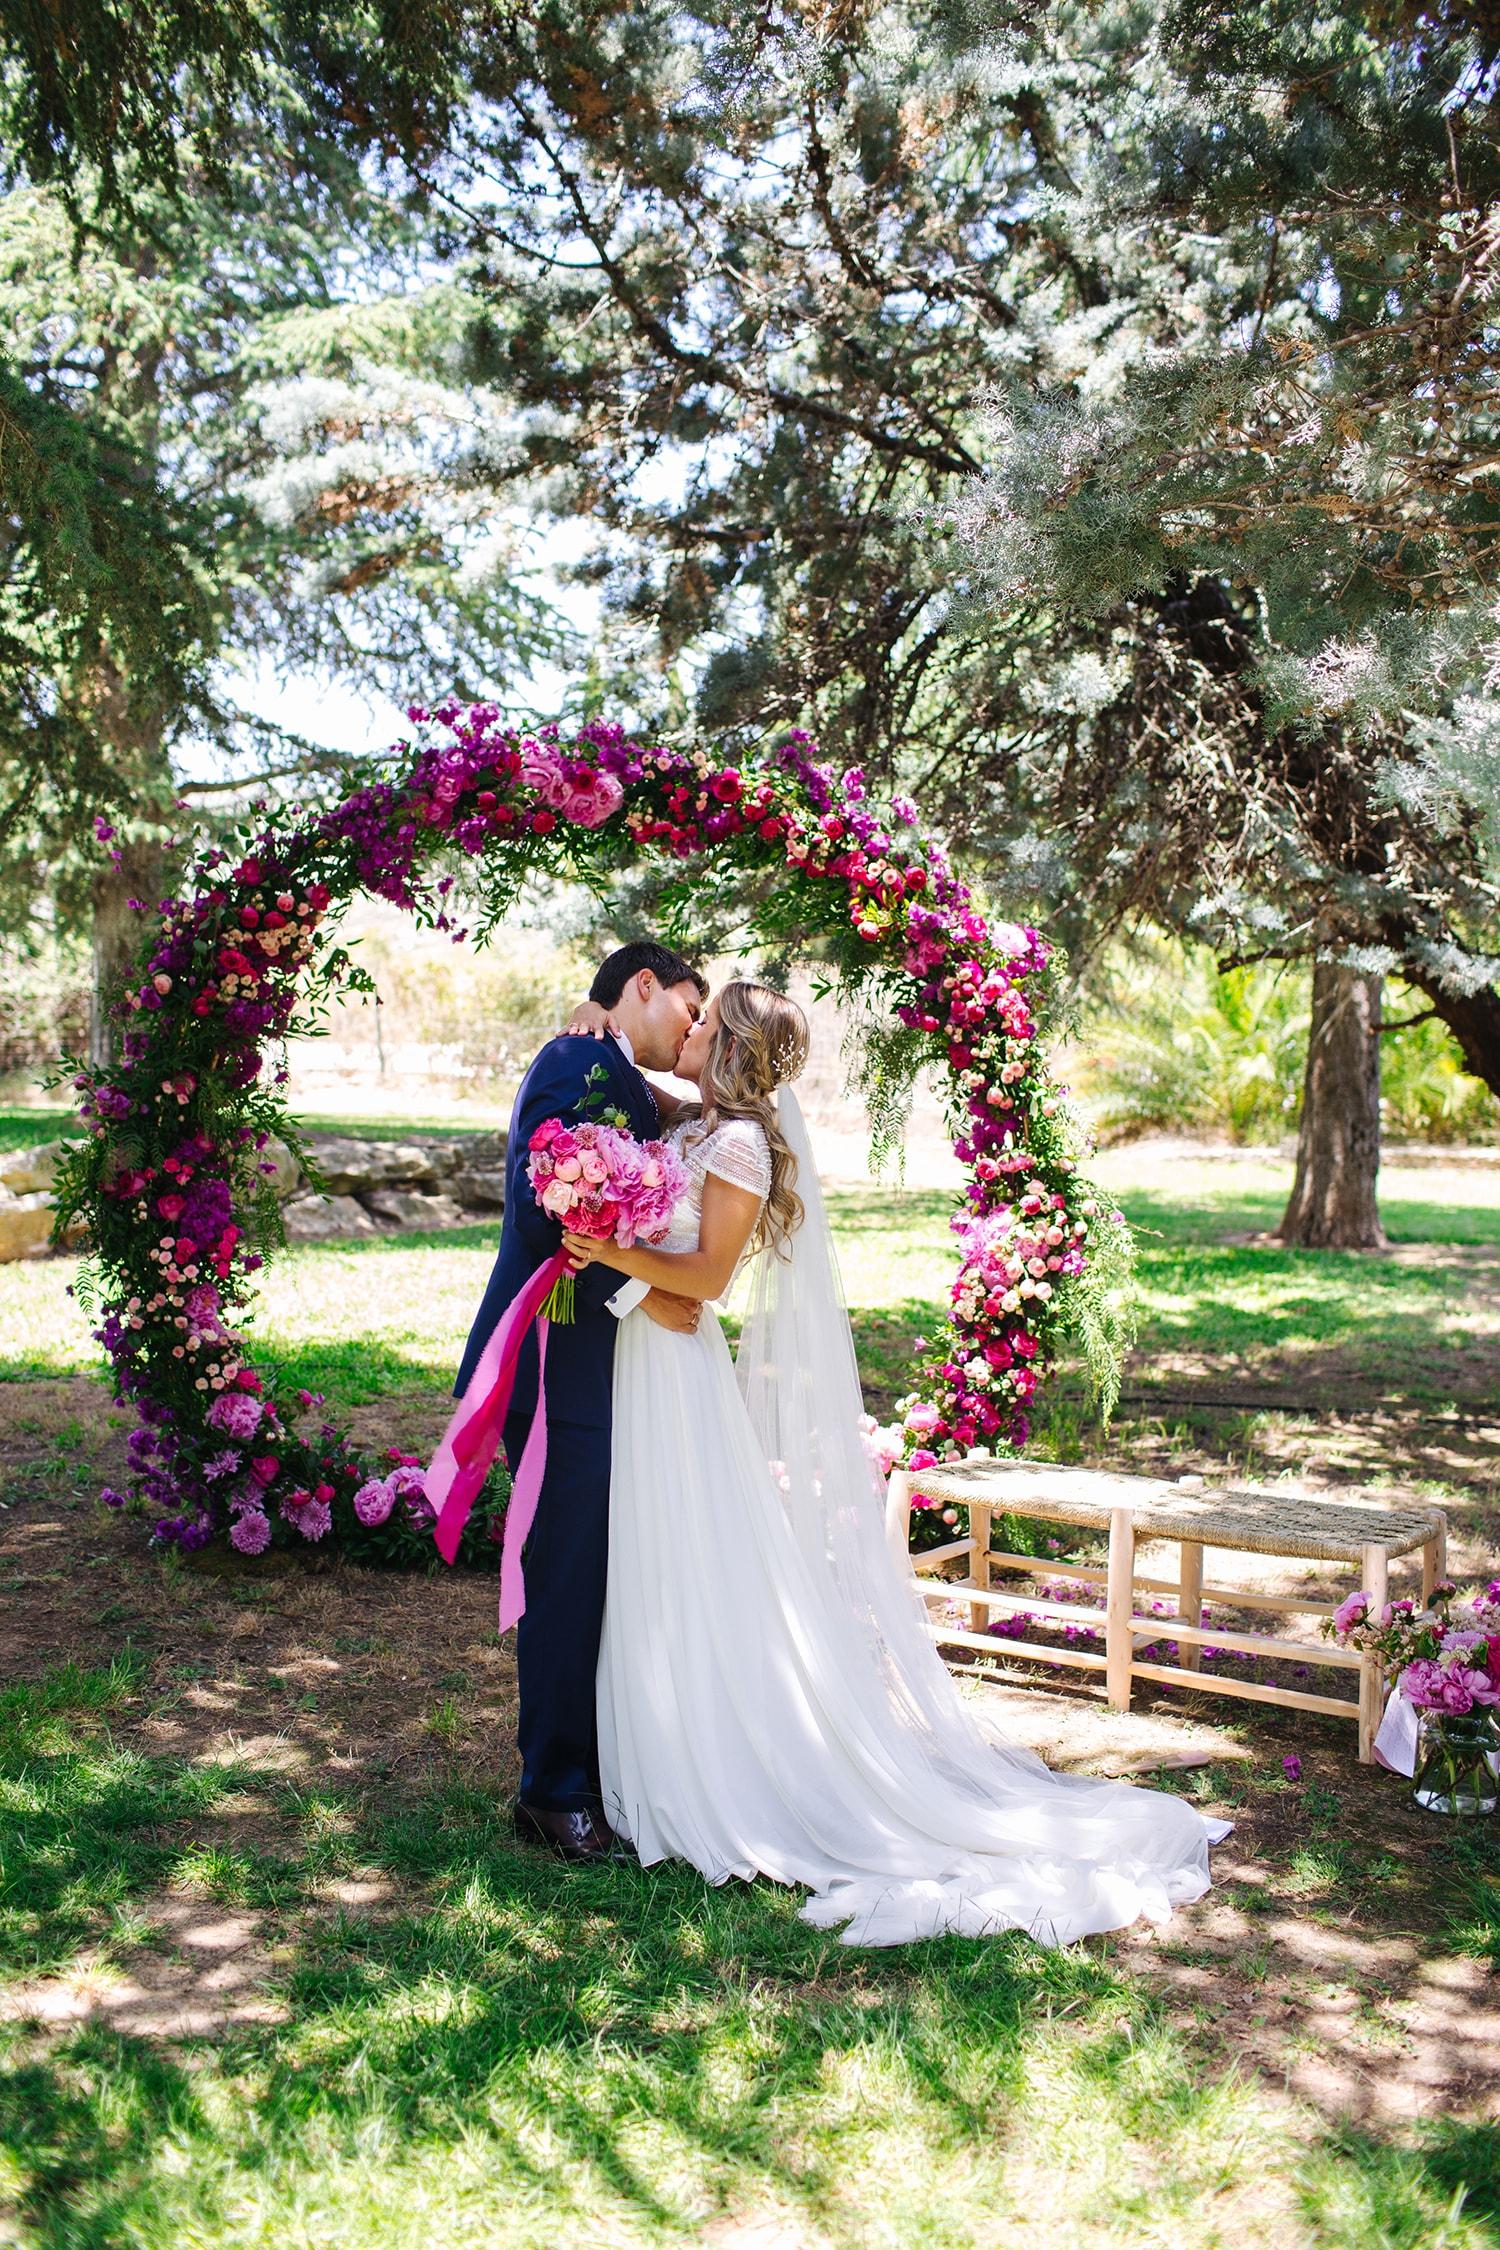 paulagfurio_bouganvillea_wedding_spain_032.jpg